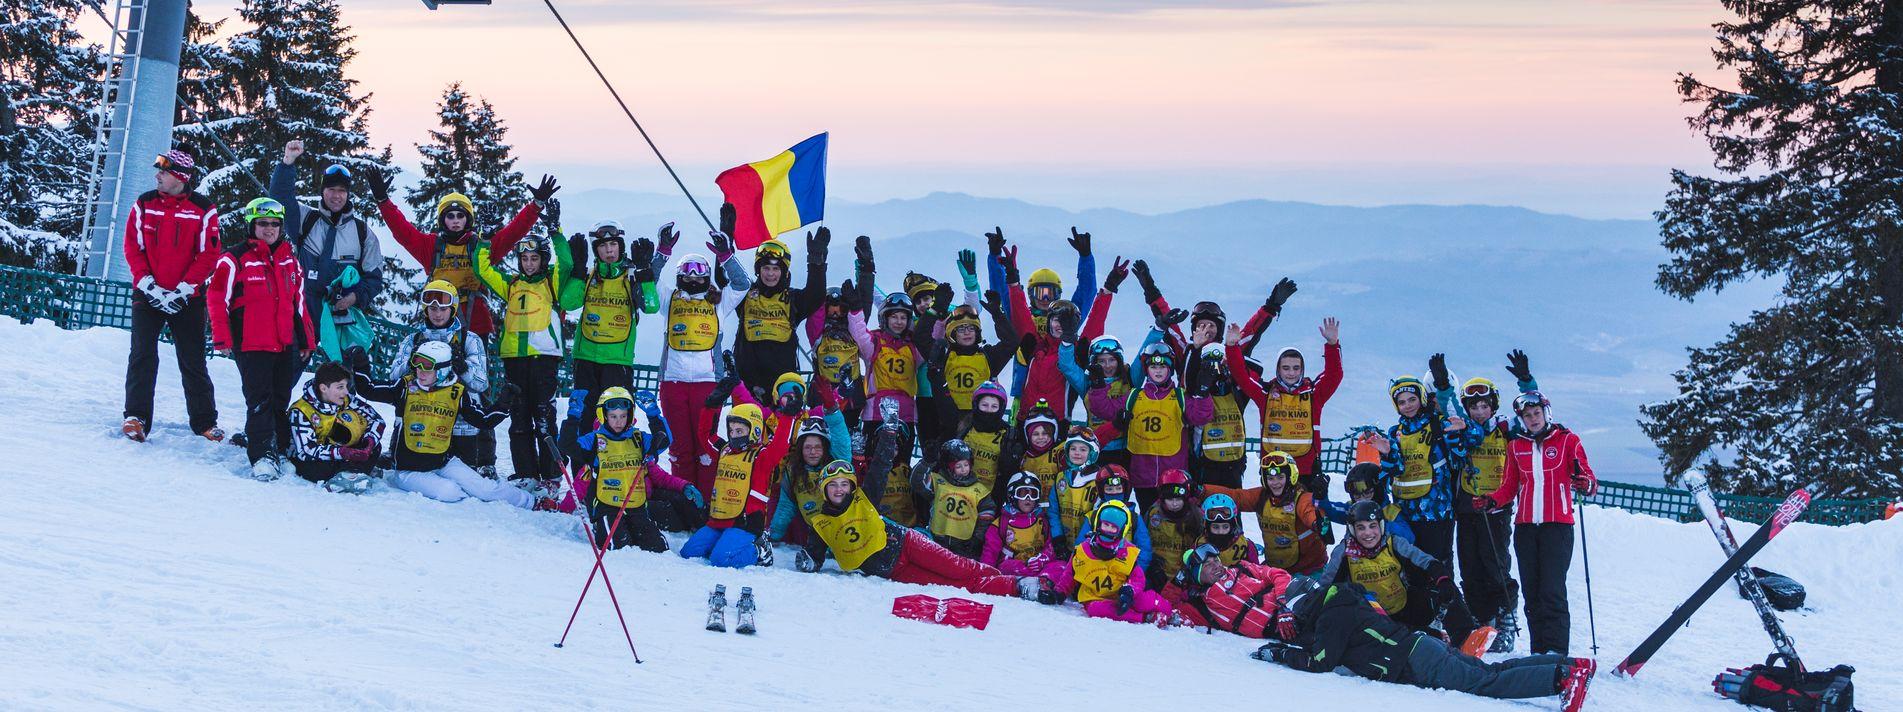 Scoala de iarna schi | Sport Ski Club | Poiana Brasov